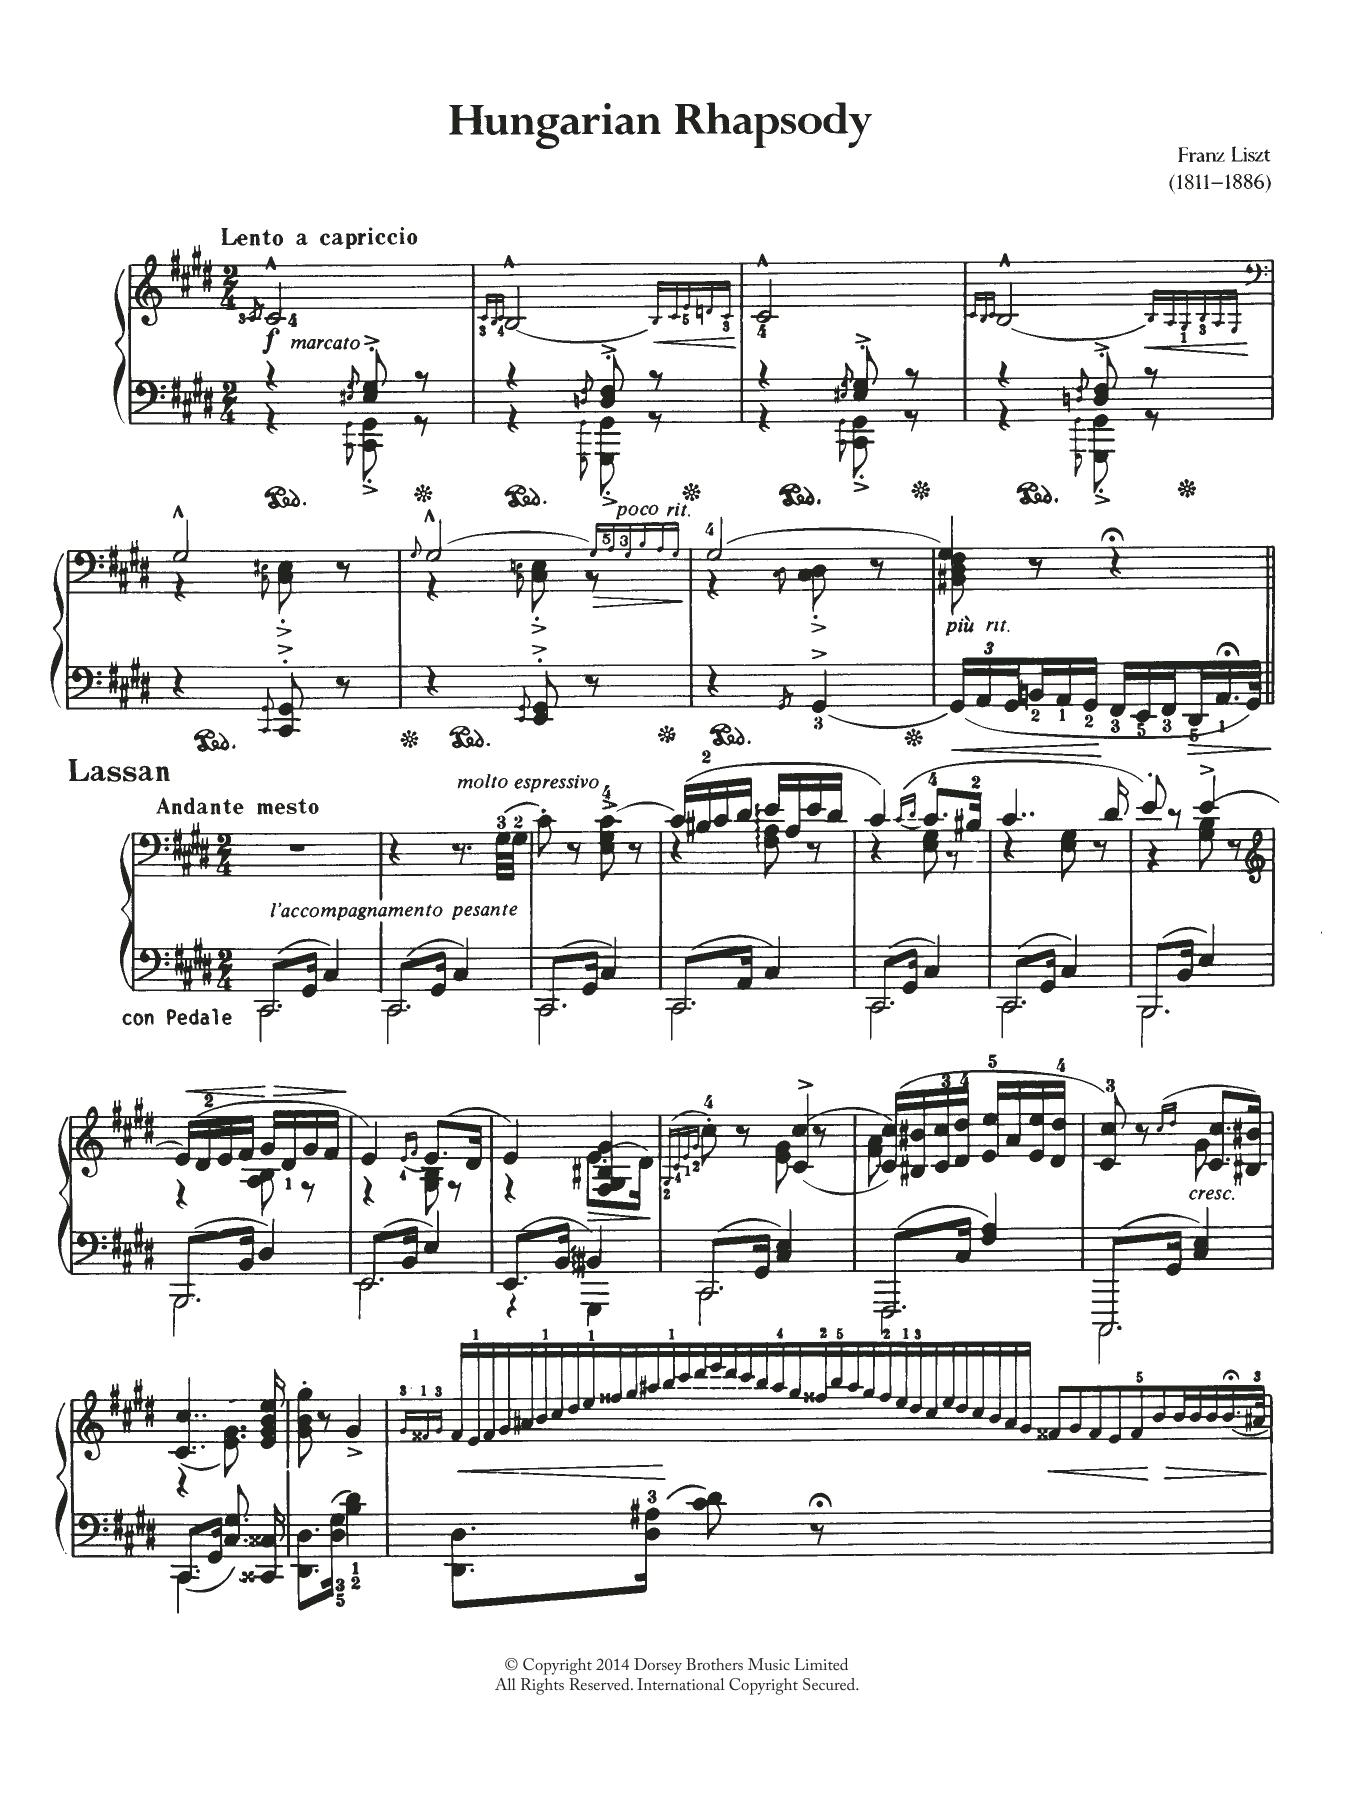 Franz Liszt - Hungarian Rhapsody (Ungarische Rhapsody) No.2